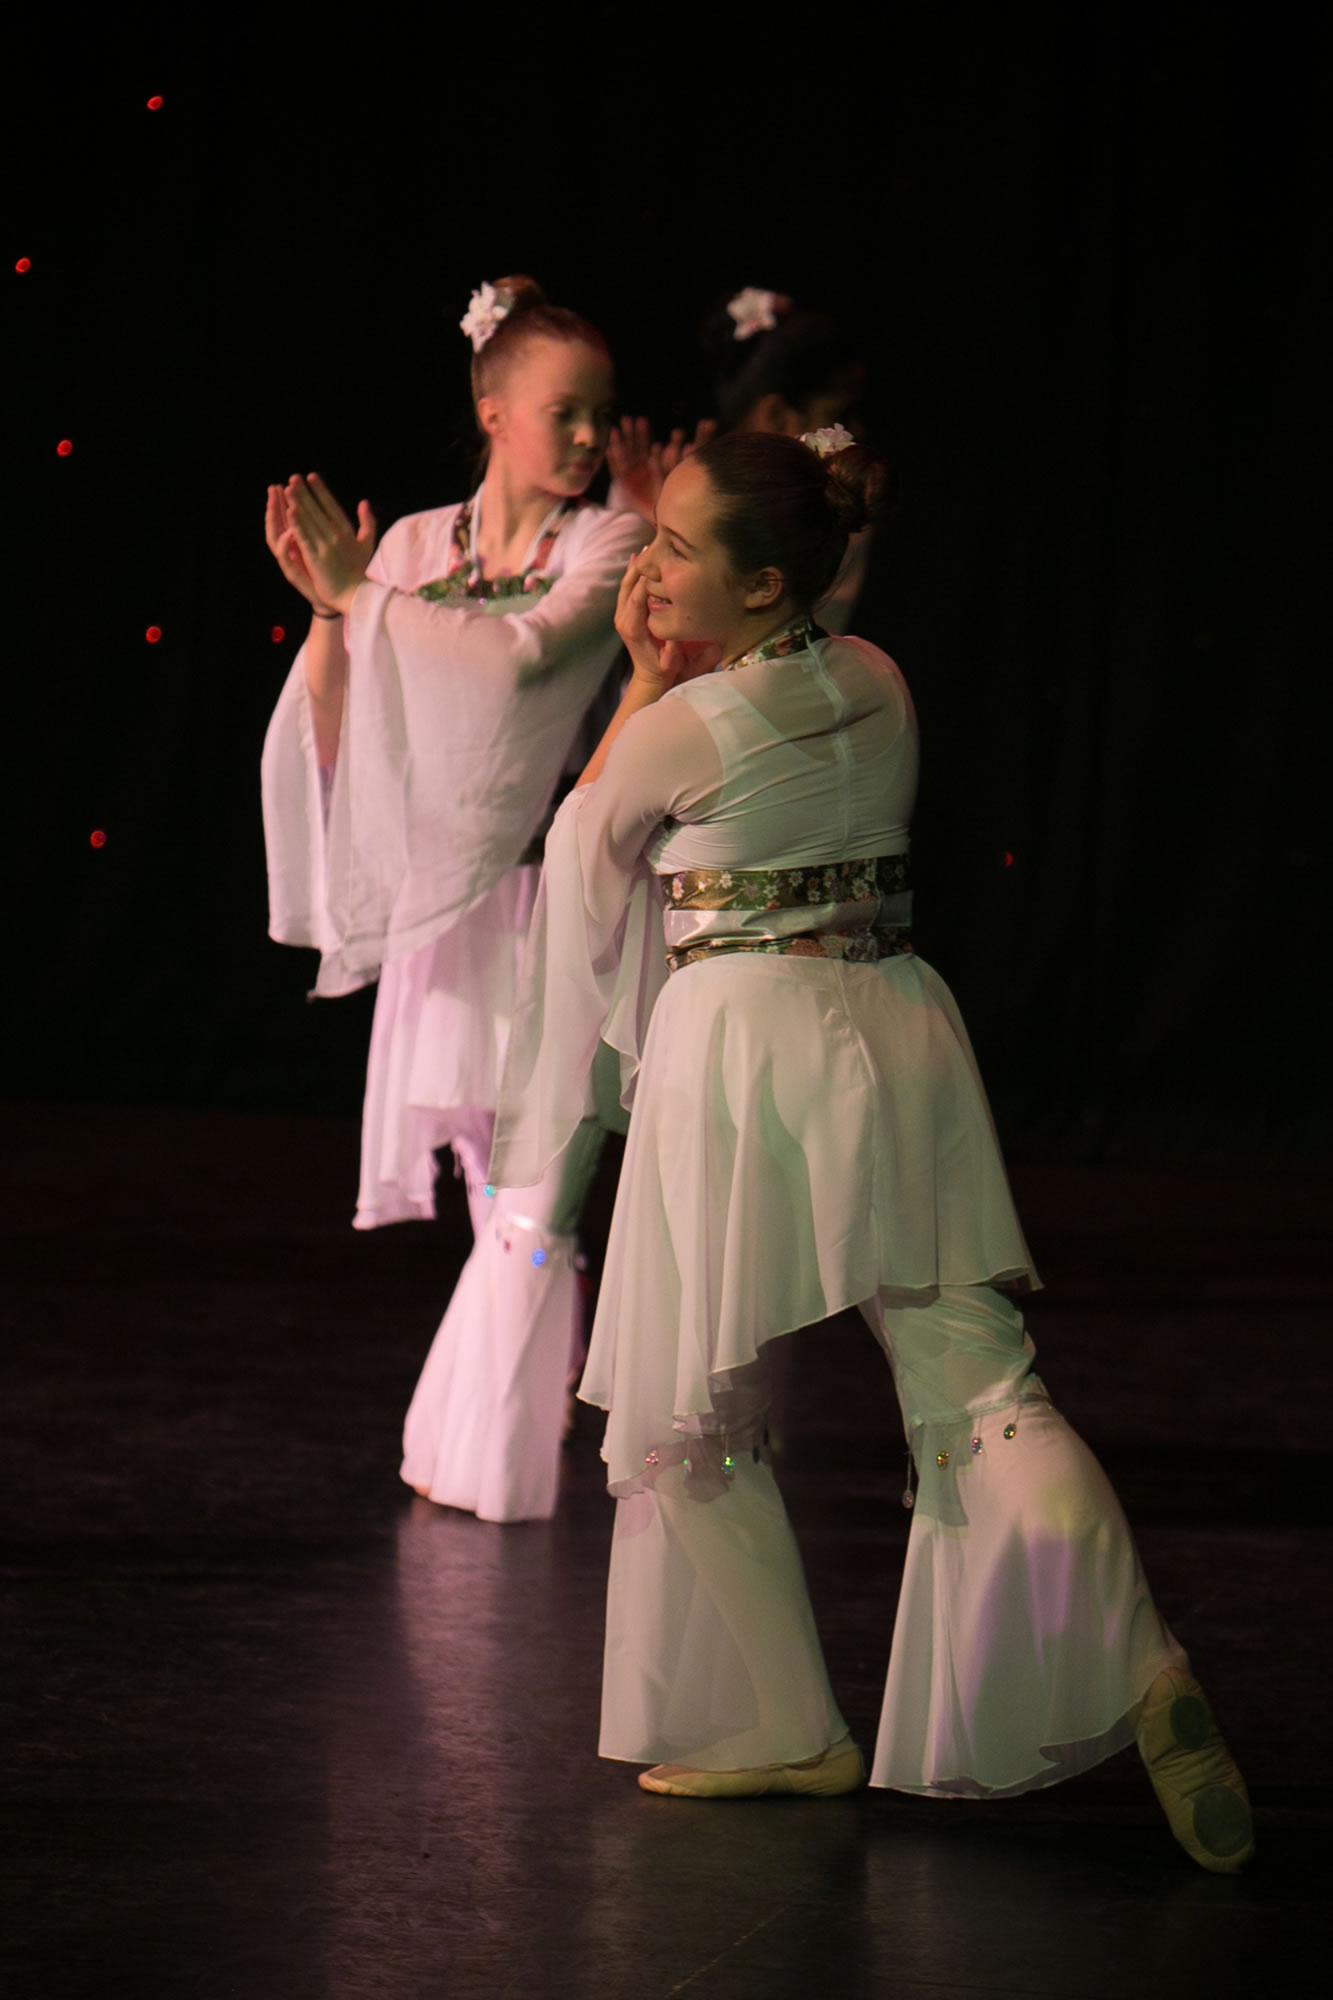 Hitchin_School_of_Dance_Show_2019-SM1_2491.jpg